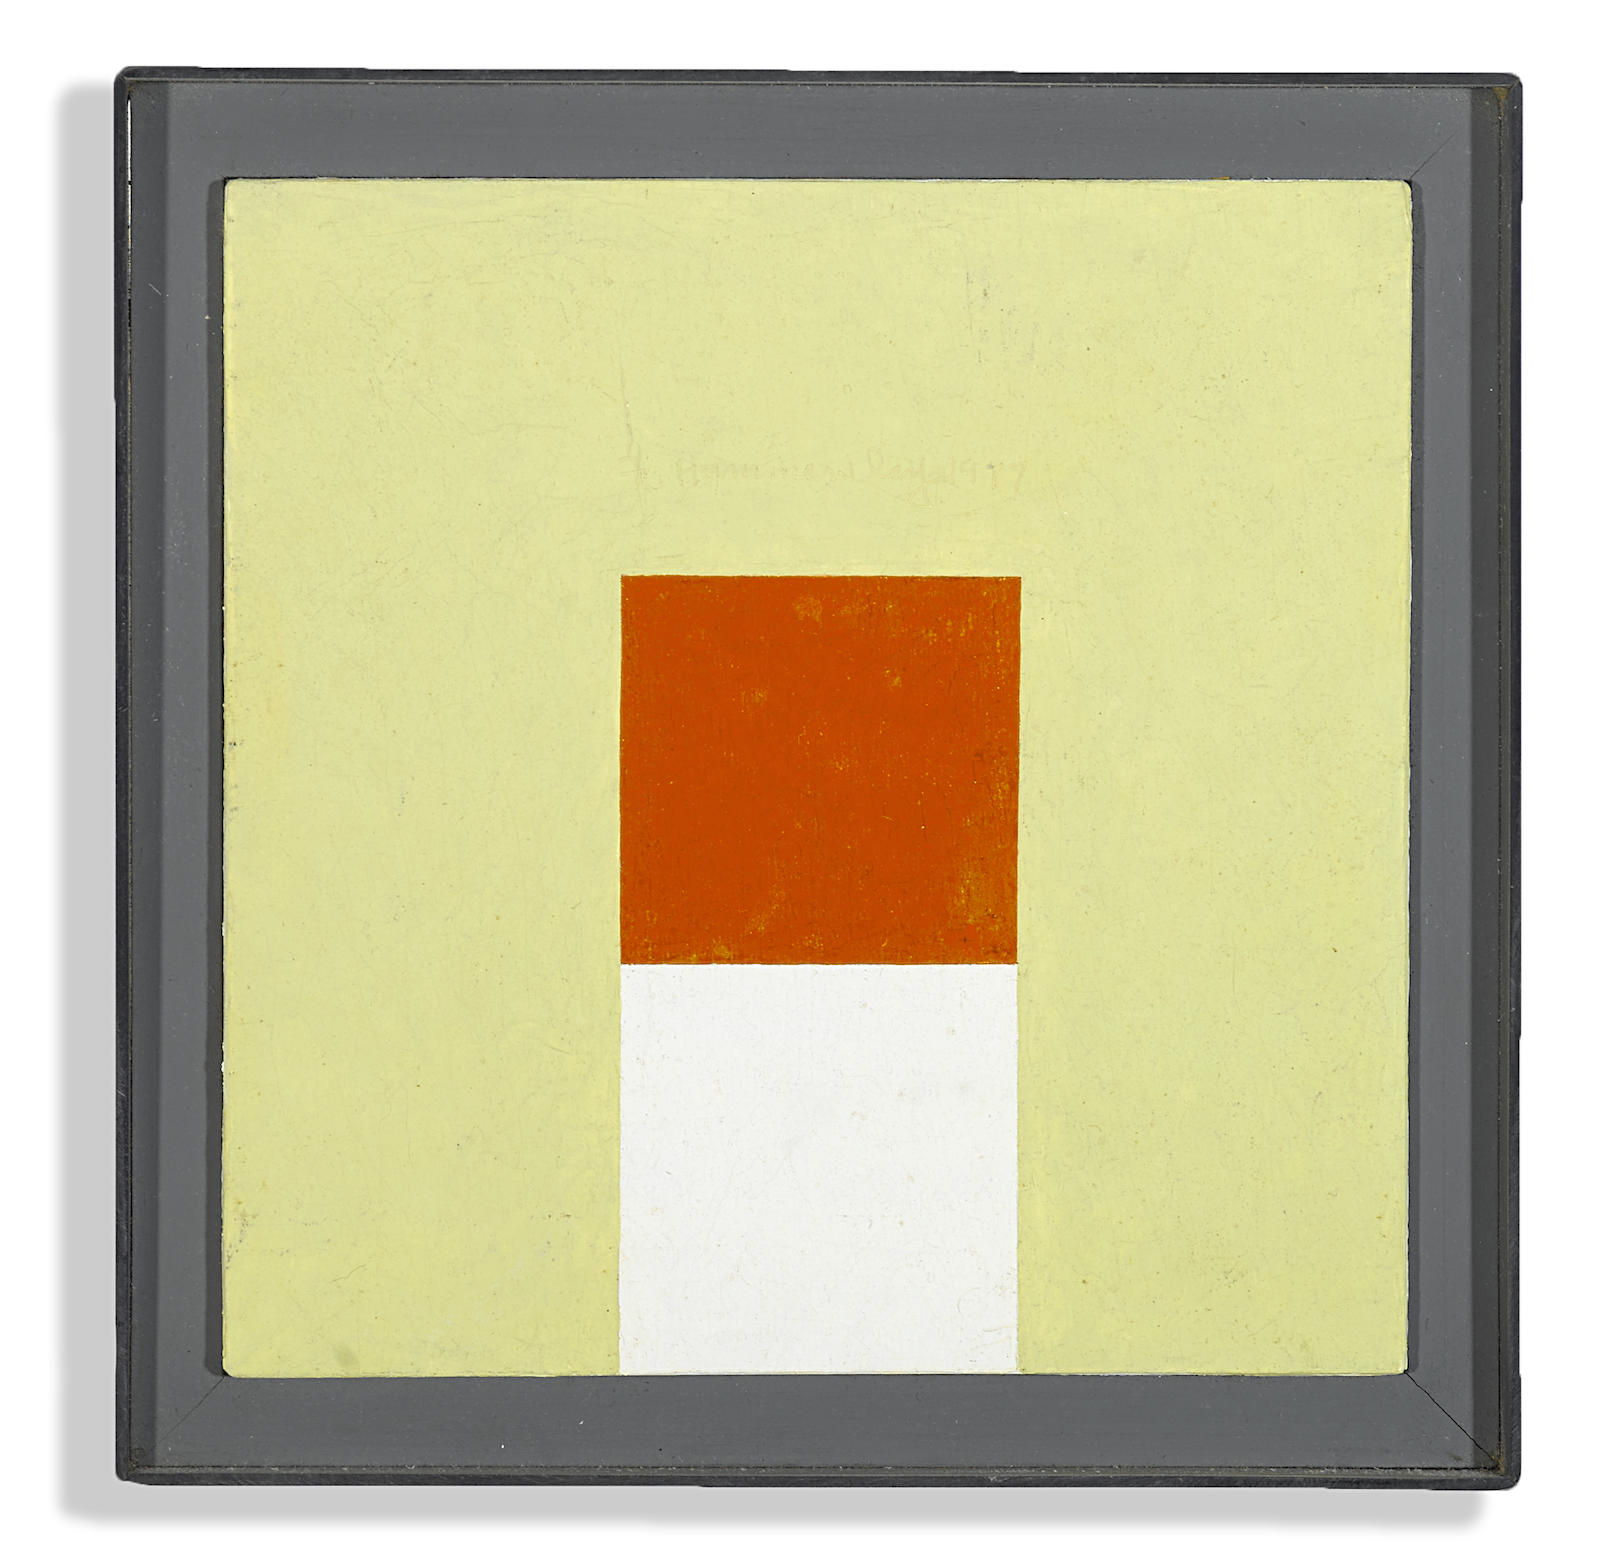 Frederick Hammersley-Mustard Seed #4-1977